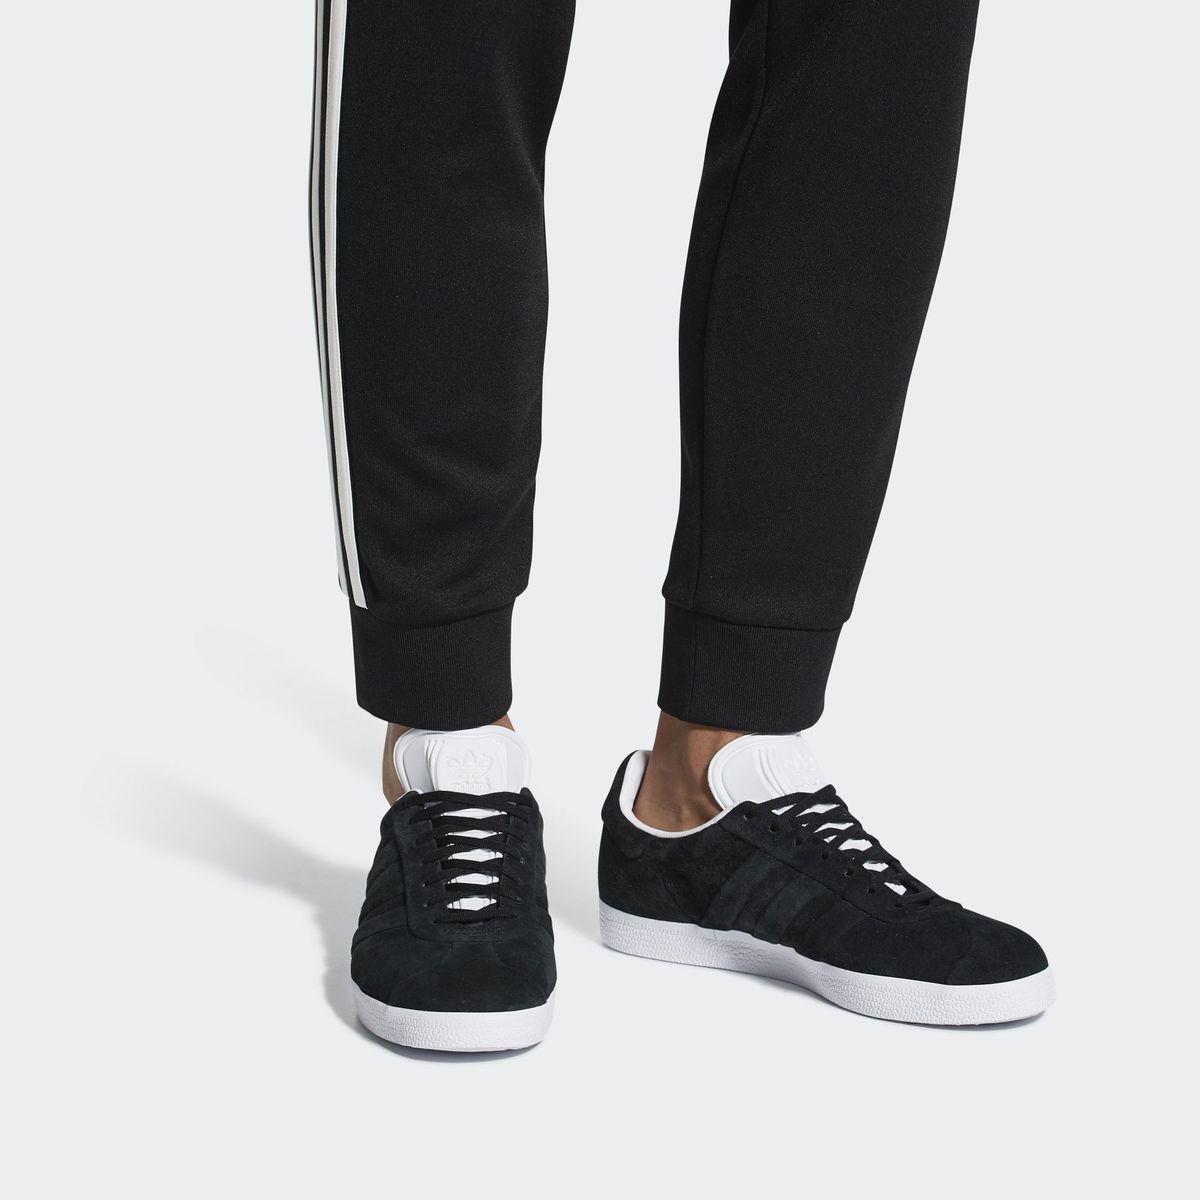 adidas gazelle femme taille 40